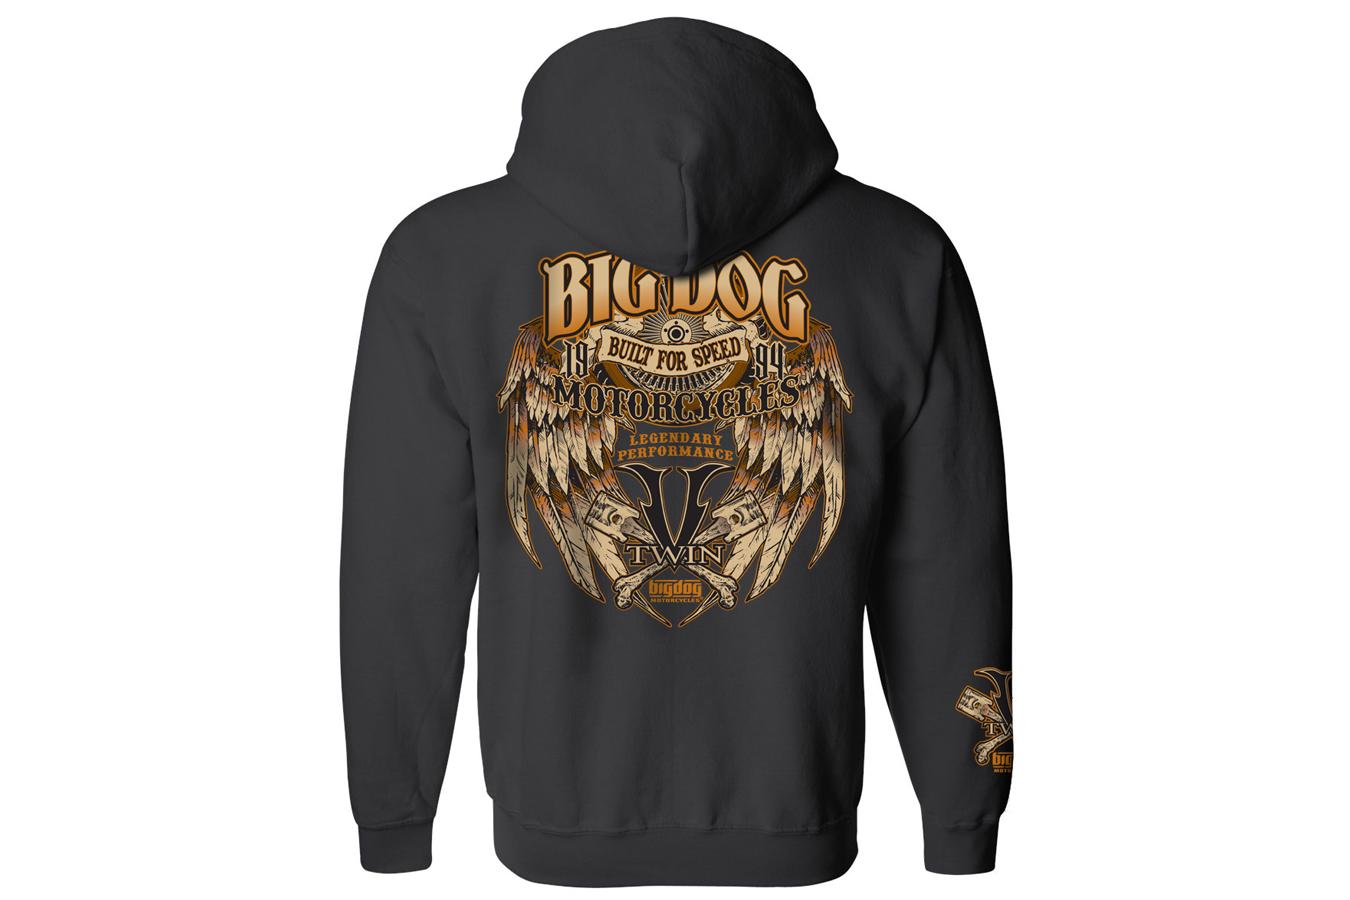 hight resolution of big dog motorcycles built for speed full zip hoodie black 54 95 58 95